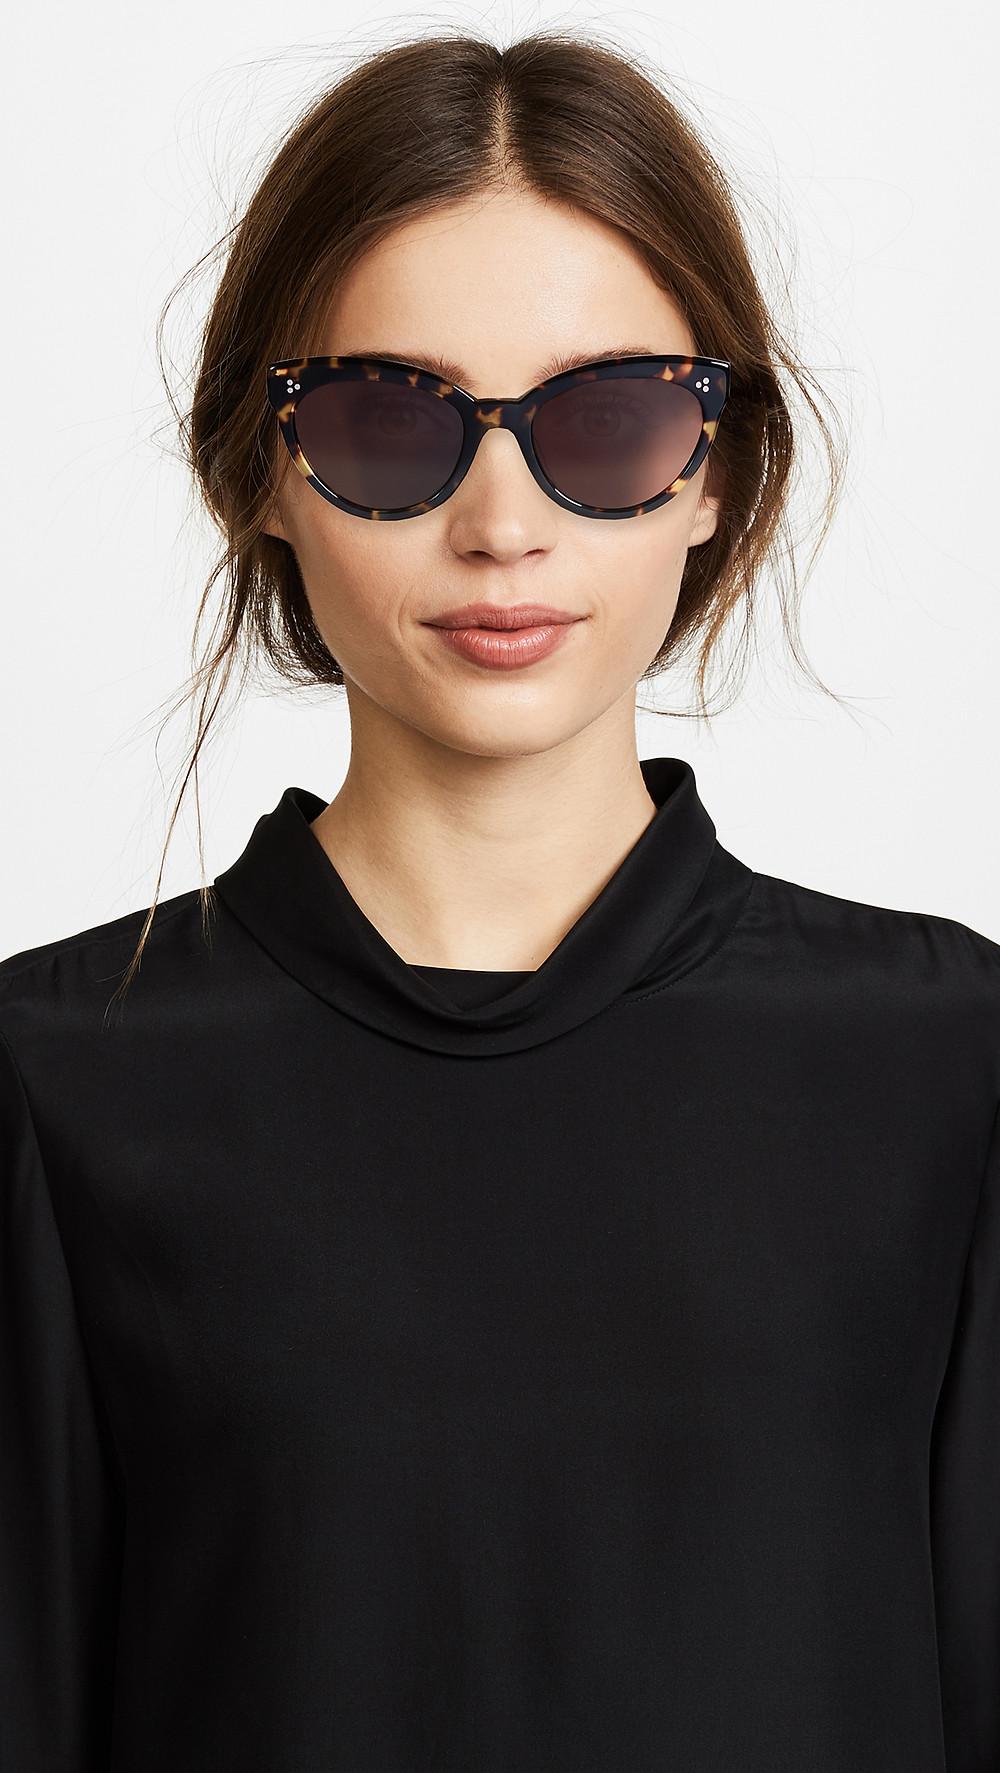 Oliver Peoples Eyewear Roella Sunglasses $350